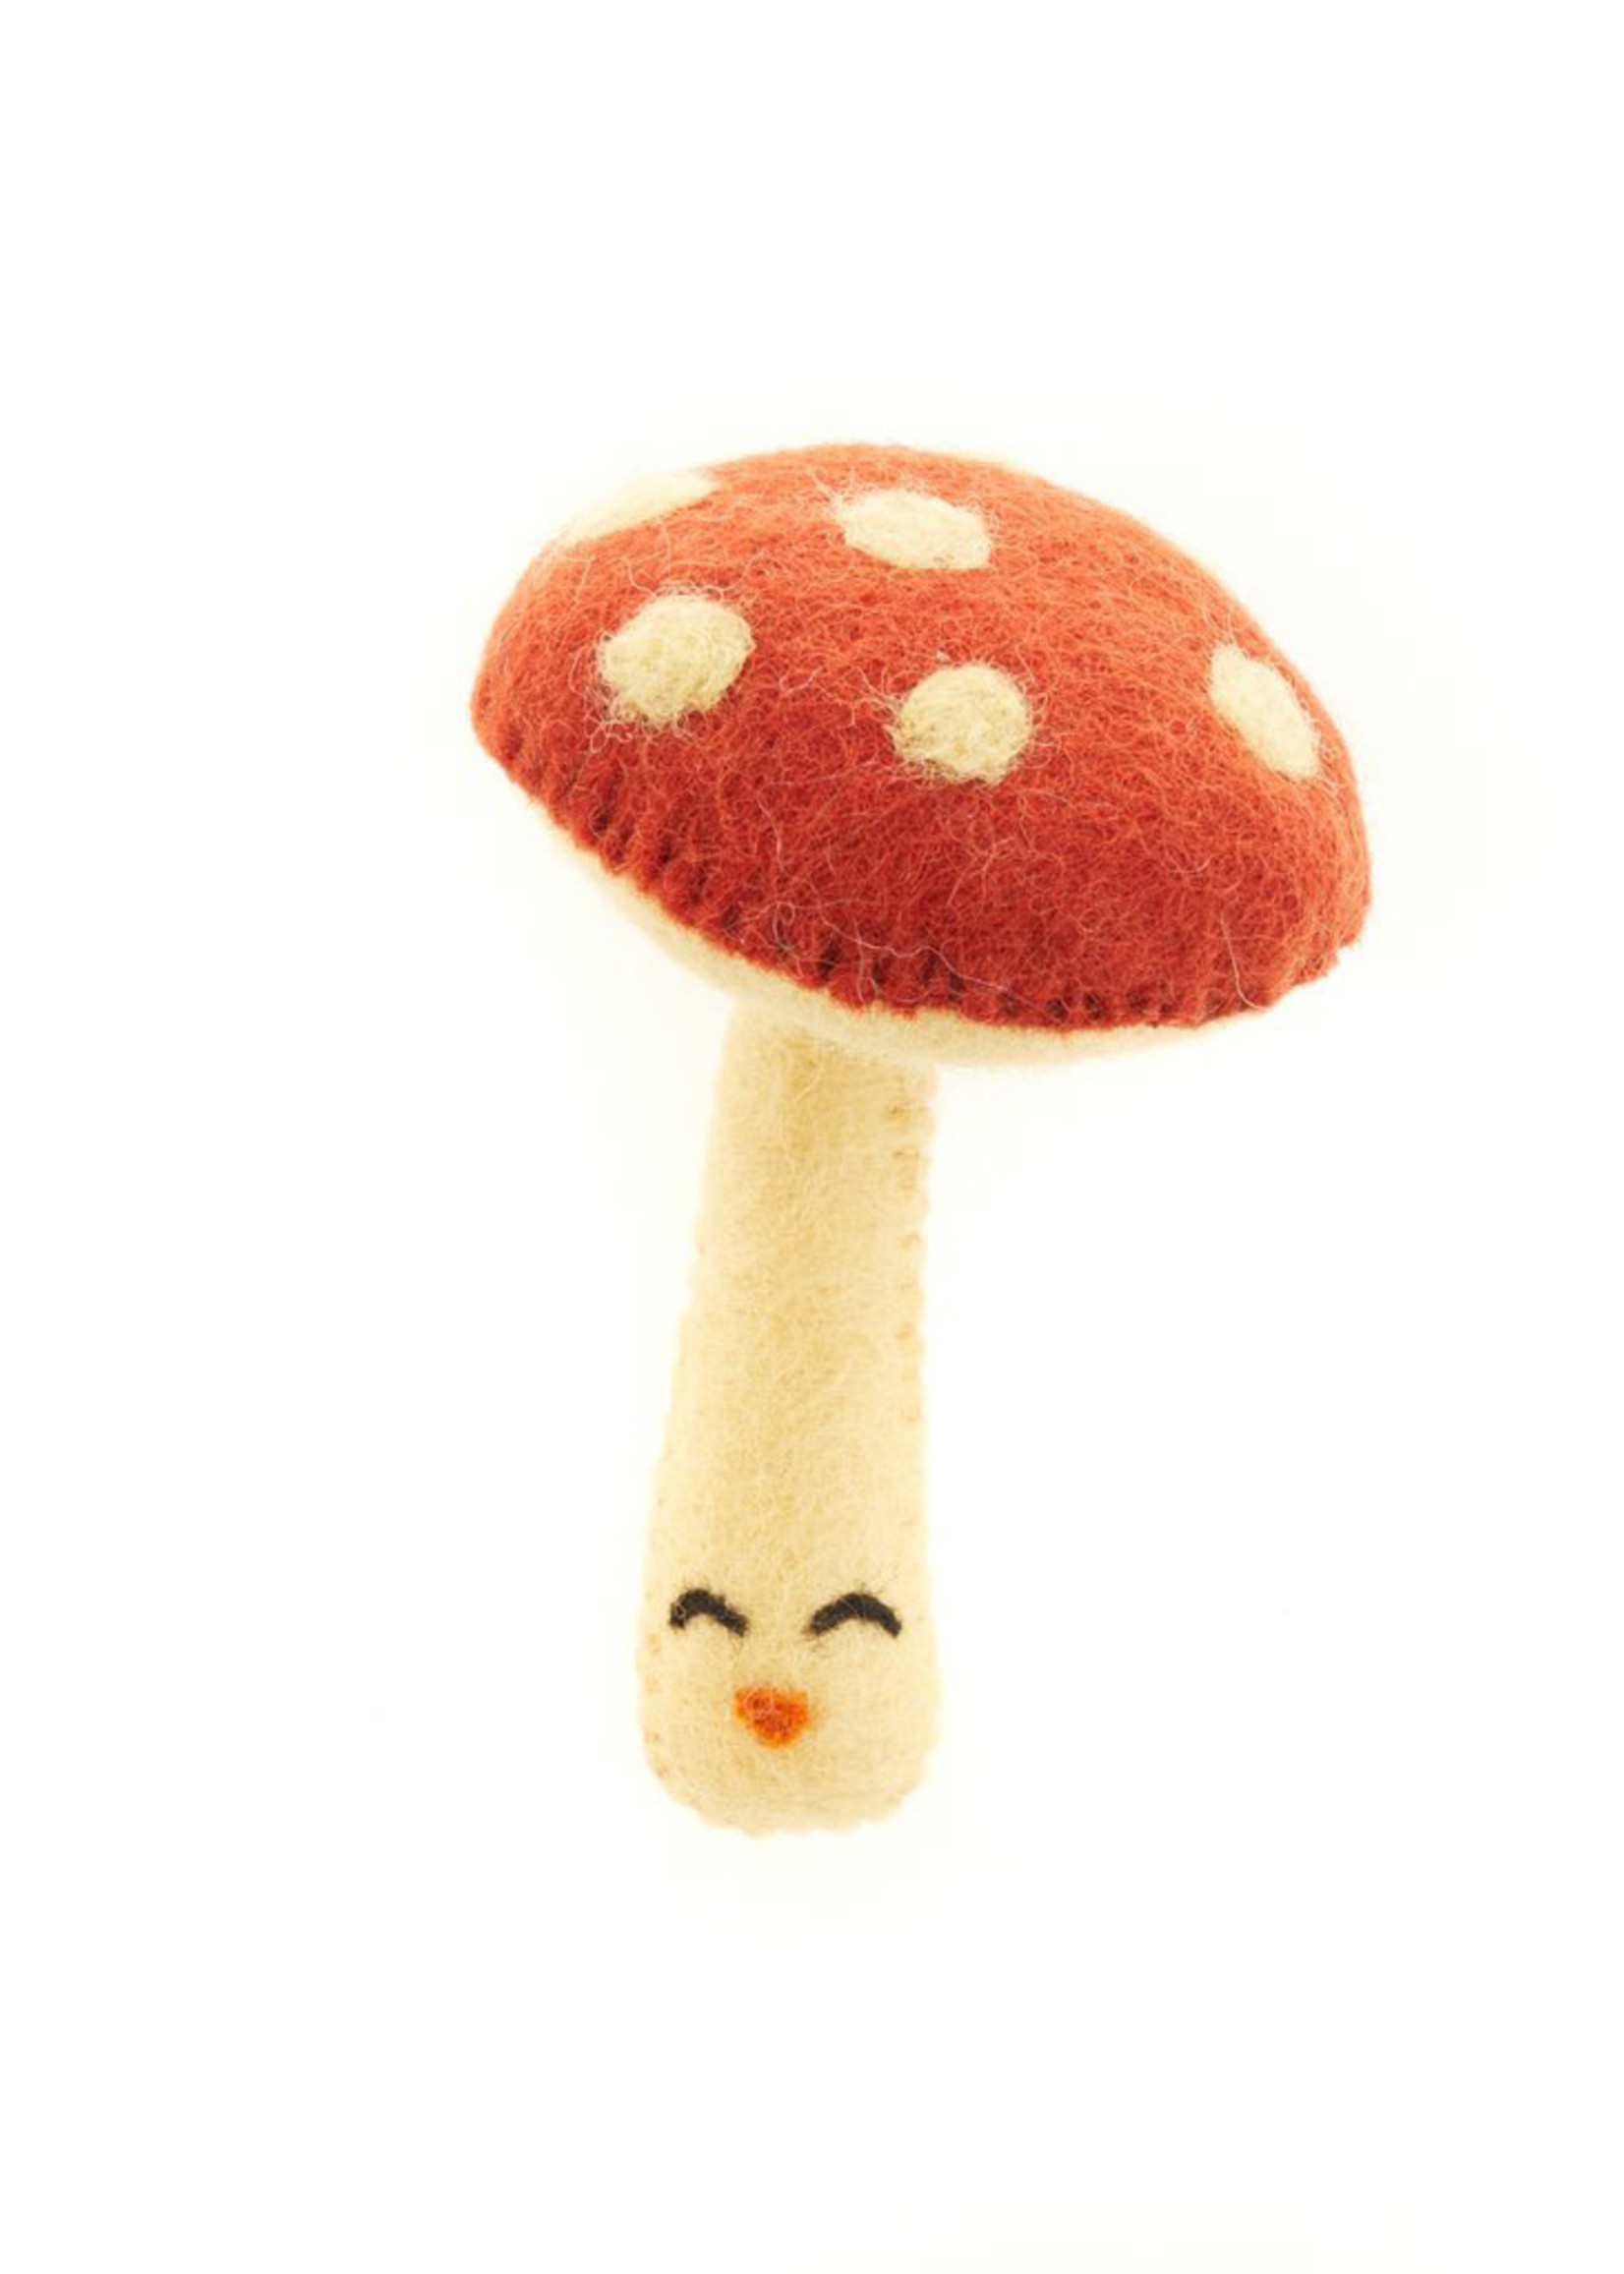 Global Goods Partners Happy Felt Mushroom Toy